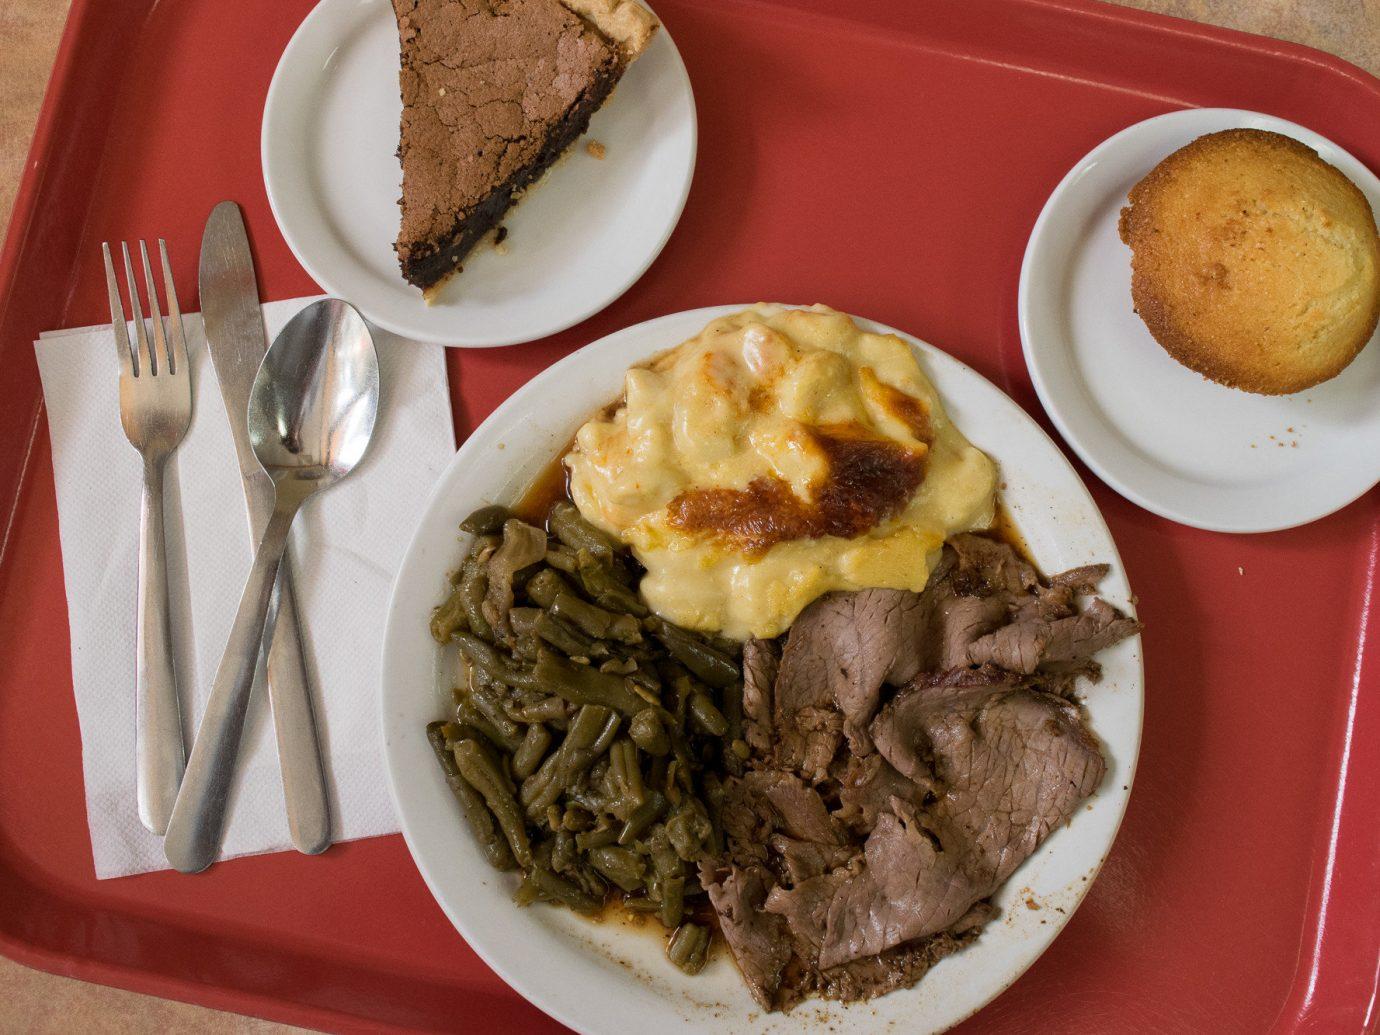 Food + Drink food plate dish meal lunch breakfast cuisine meat restaurant piece de resistance